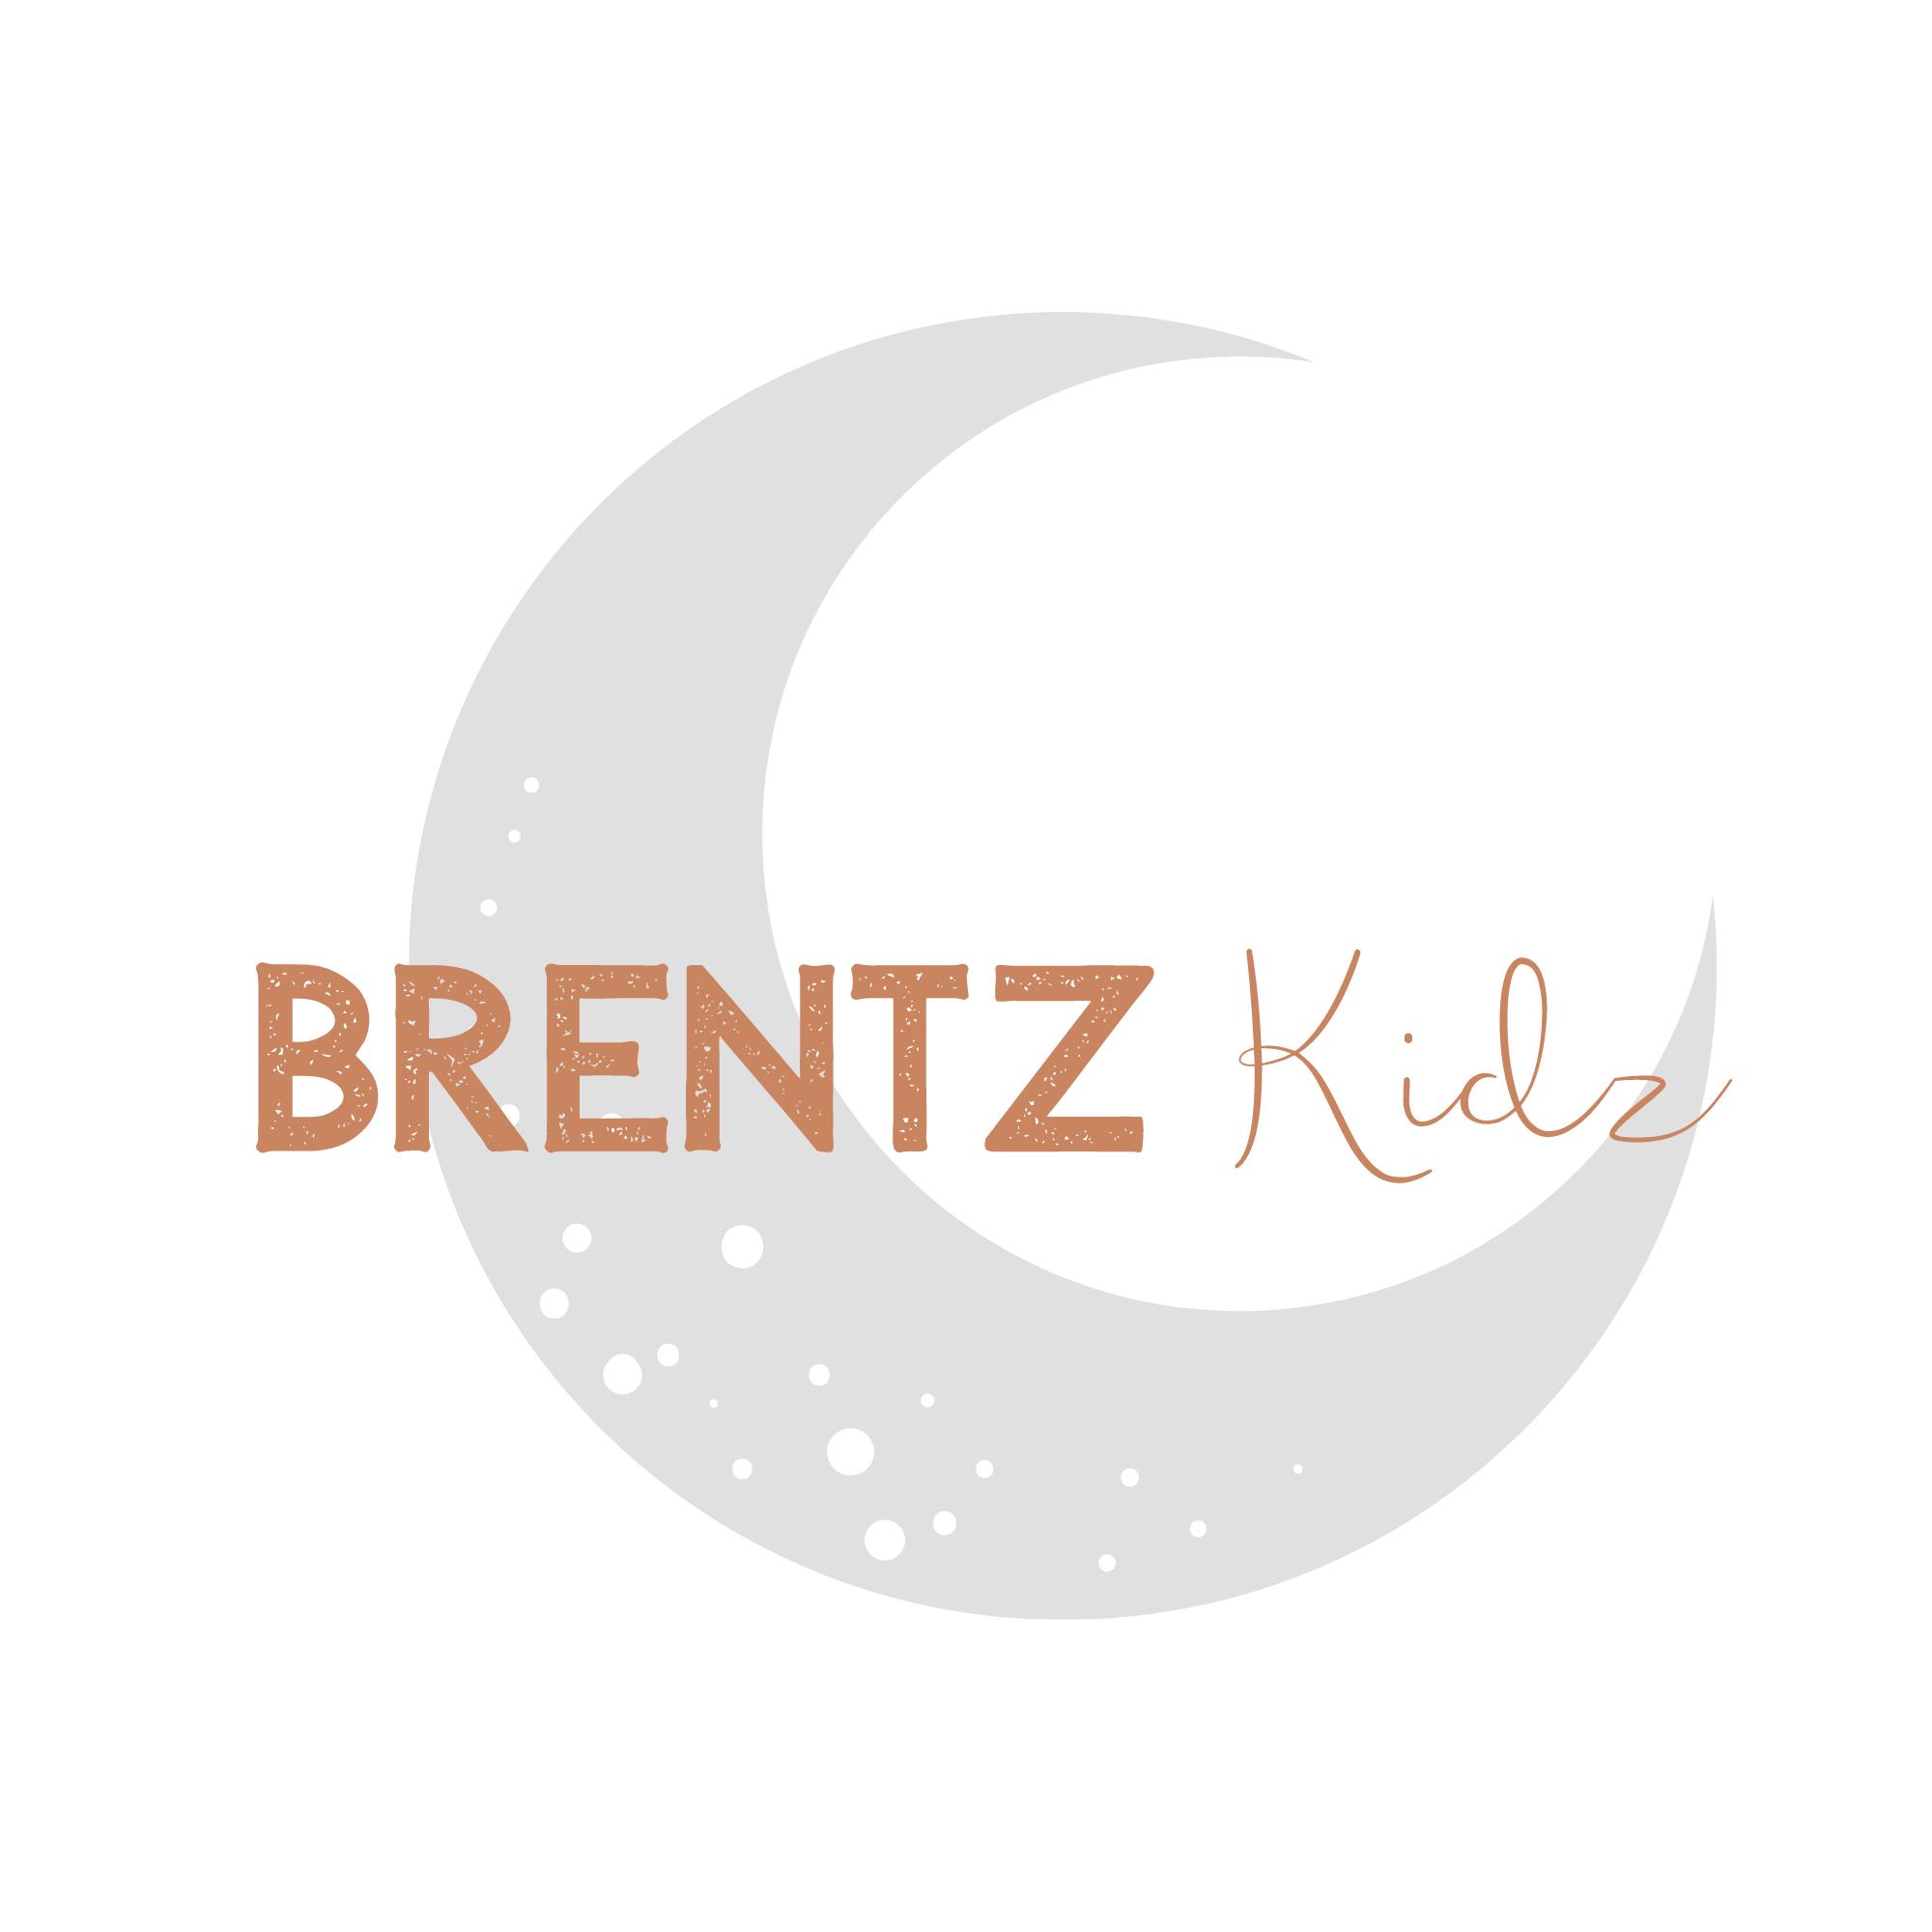 Brentz Kidz